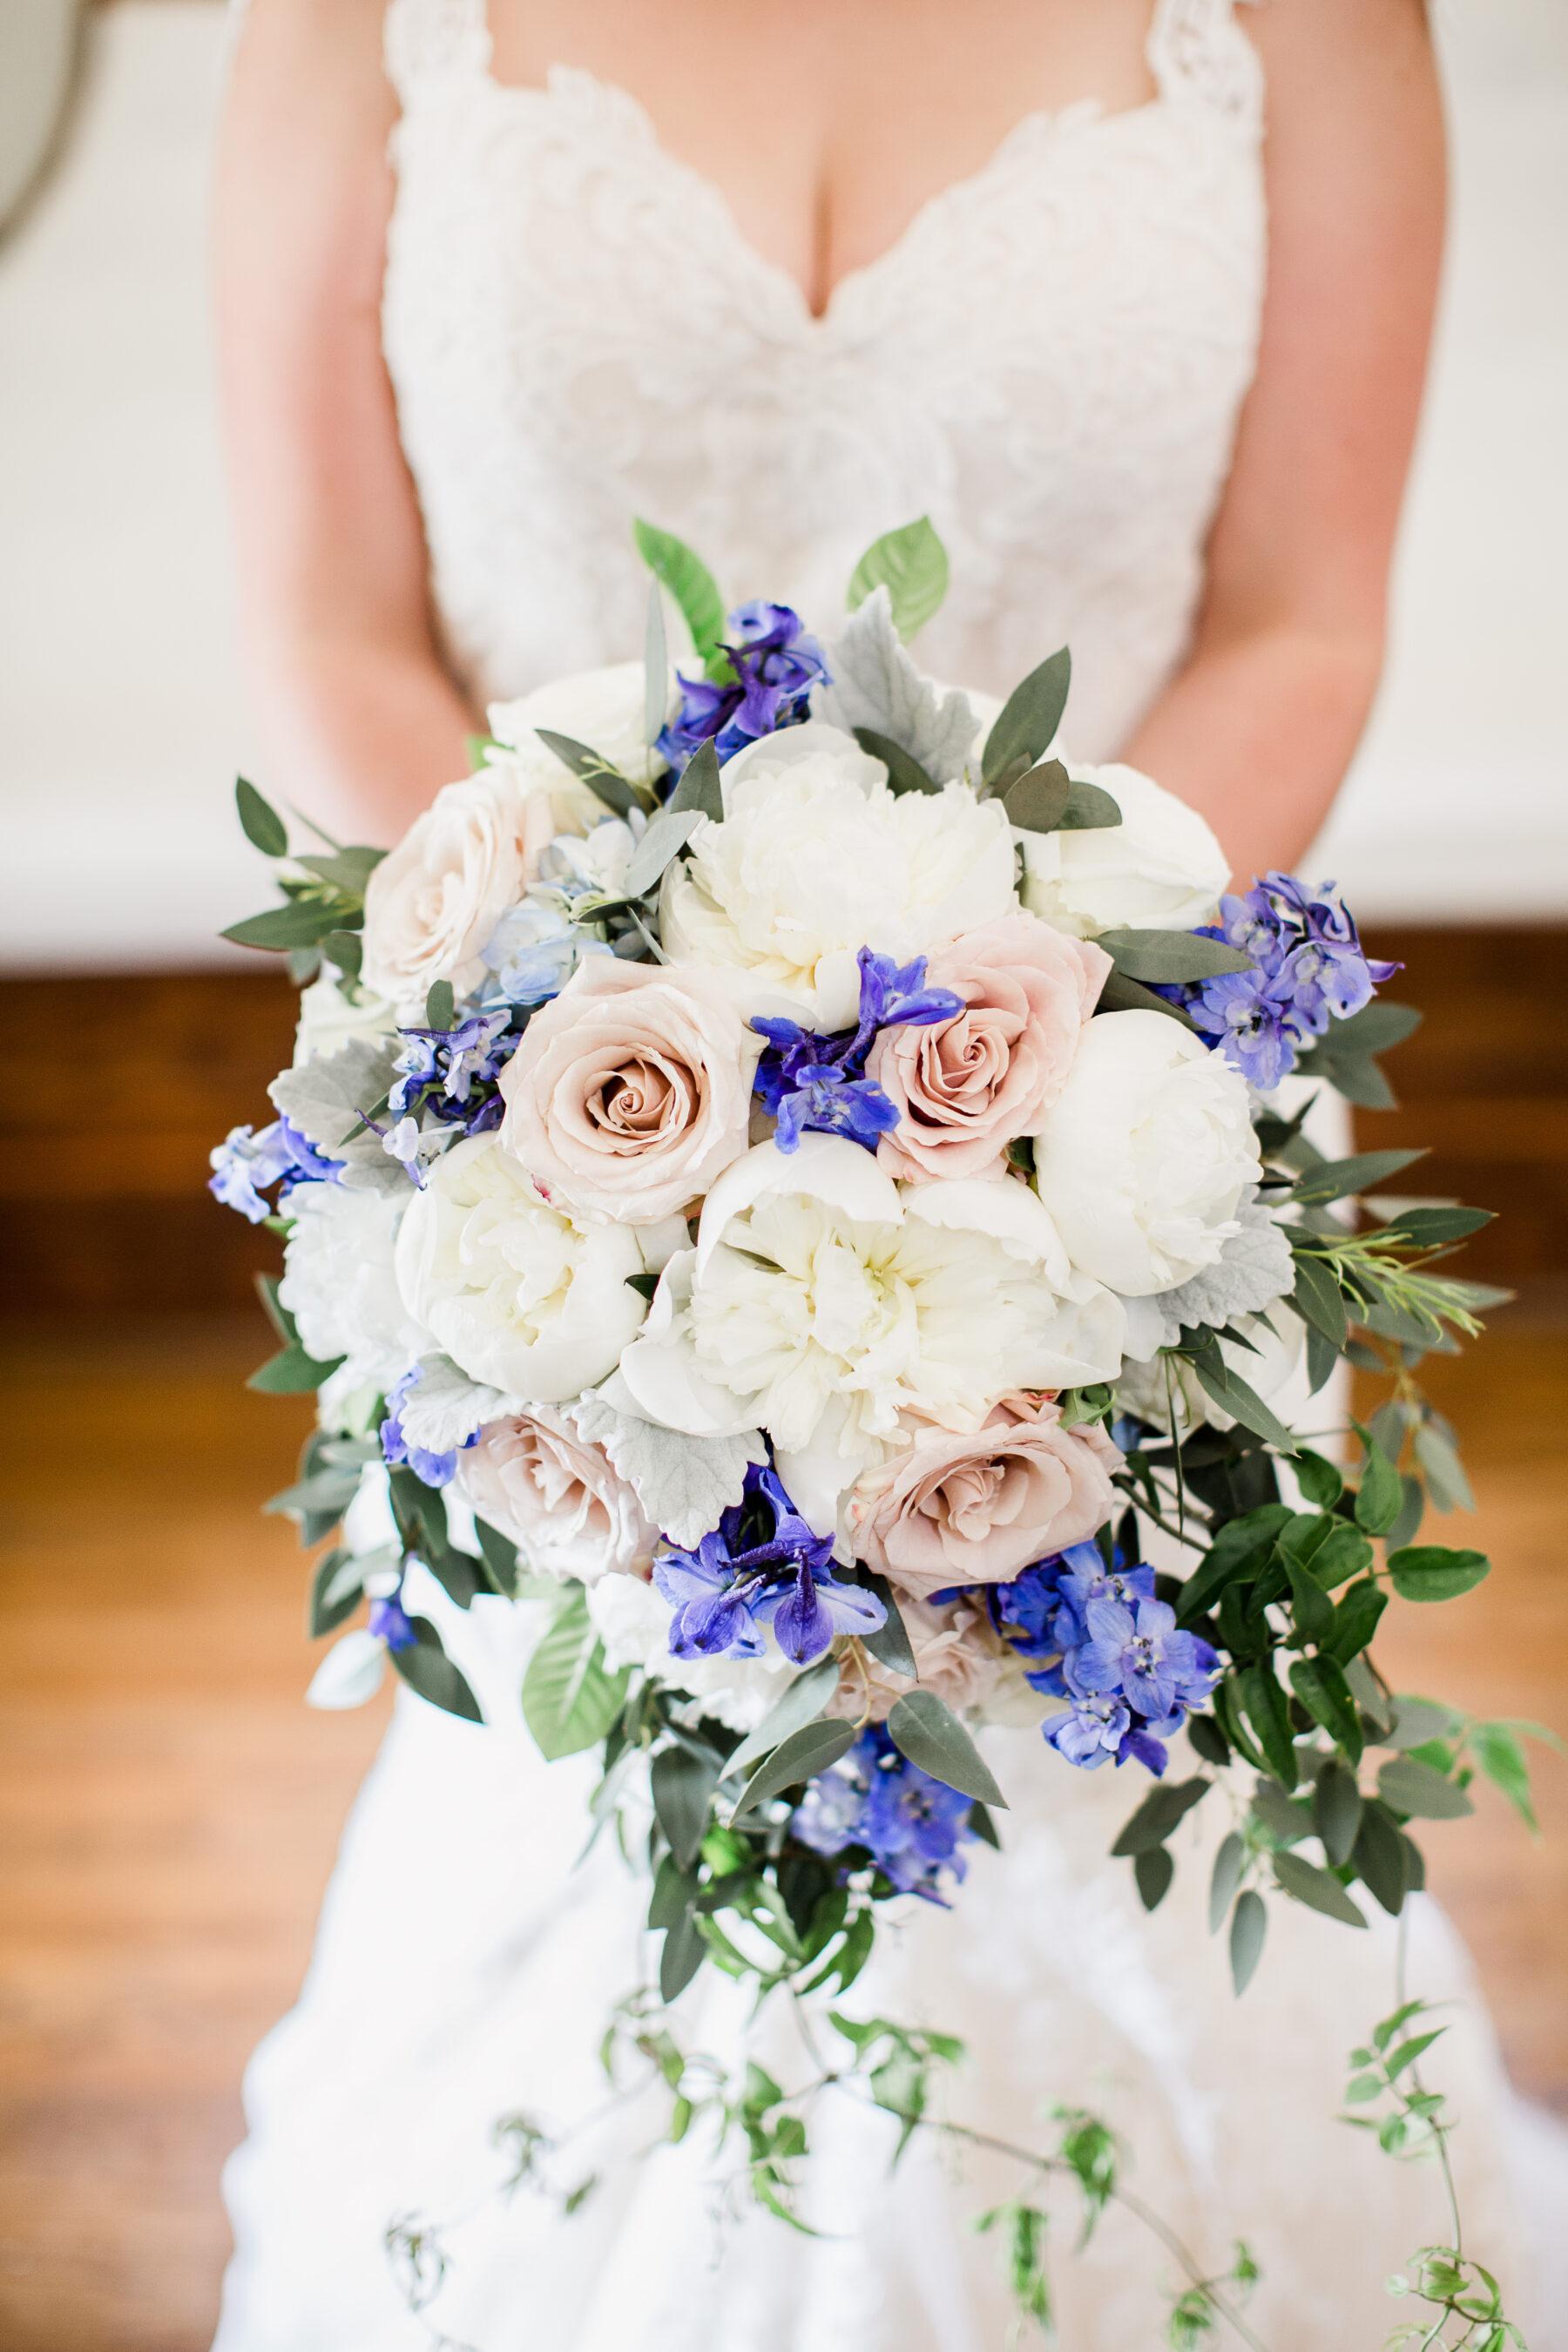 Enchanted Florist Wedding Bouquet Romantic Garden Wedding at CJ's Off the Square | Nashville Bride Guide